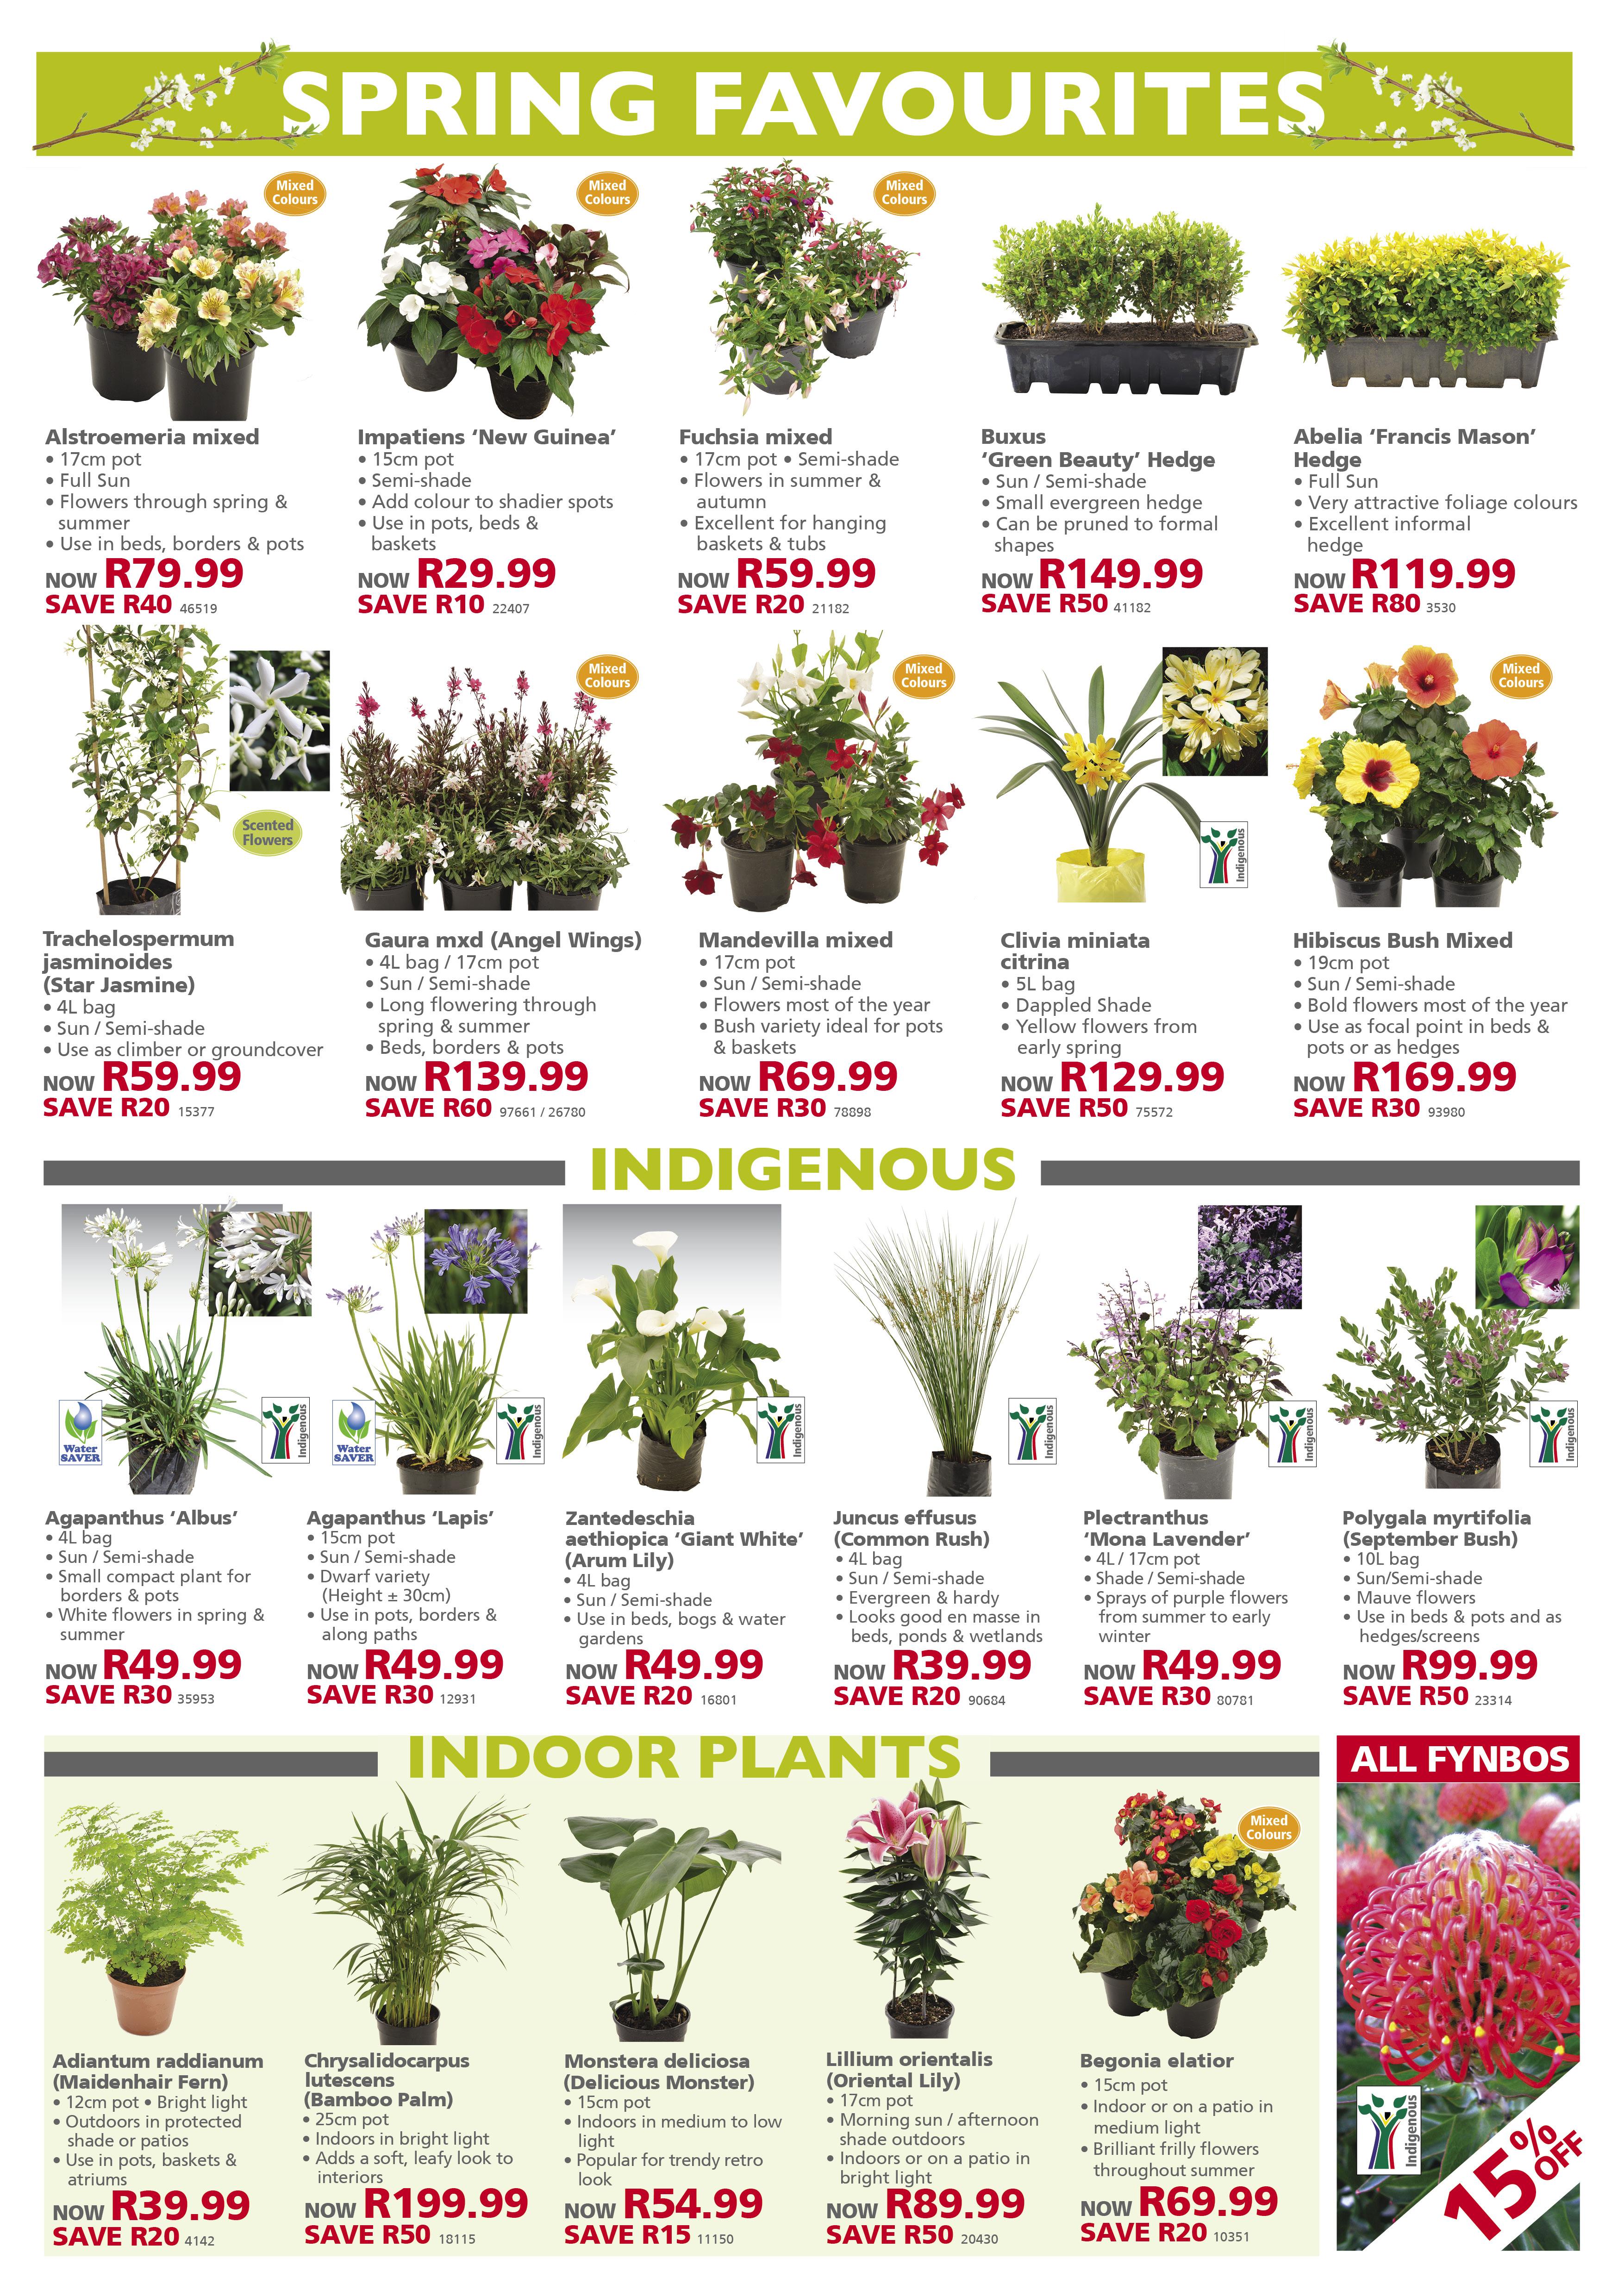 lifestyle home garden nursery plant shop leaflet specials spring